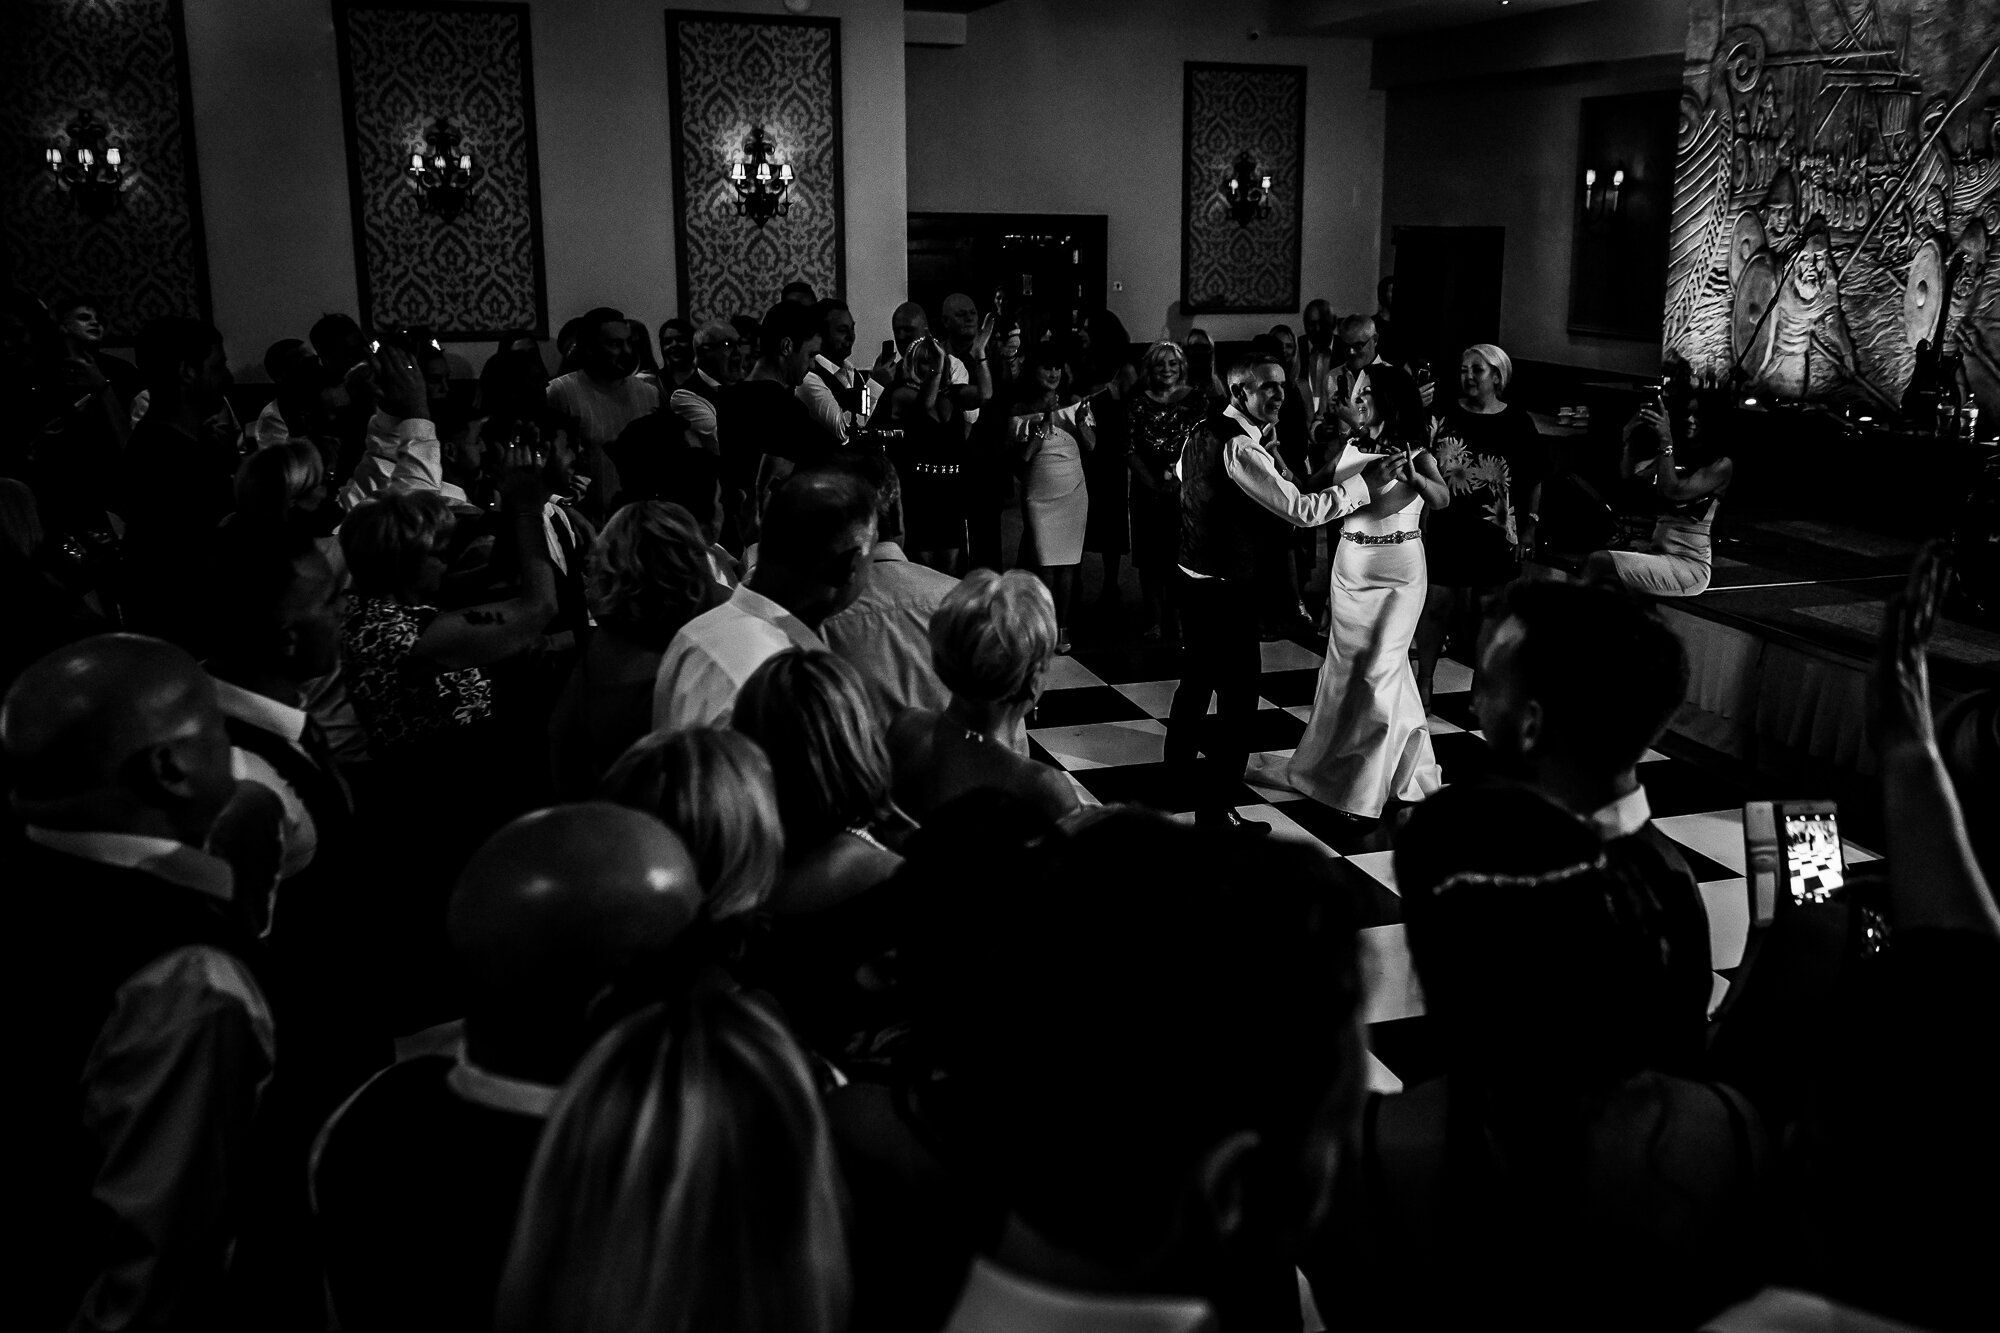 Clontarf Caste wedding photographer Wedding Photography dublin ireland wedding photographer (53 of 58).jpg